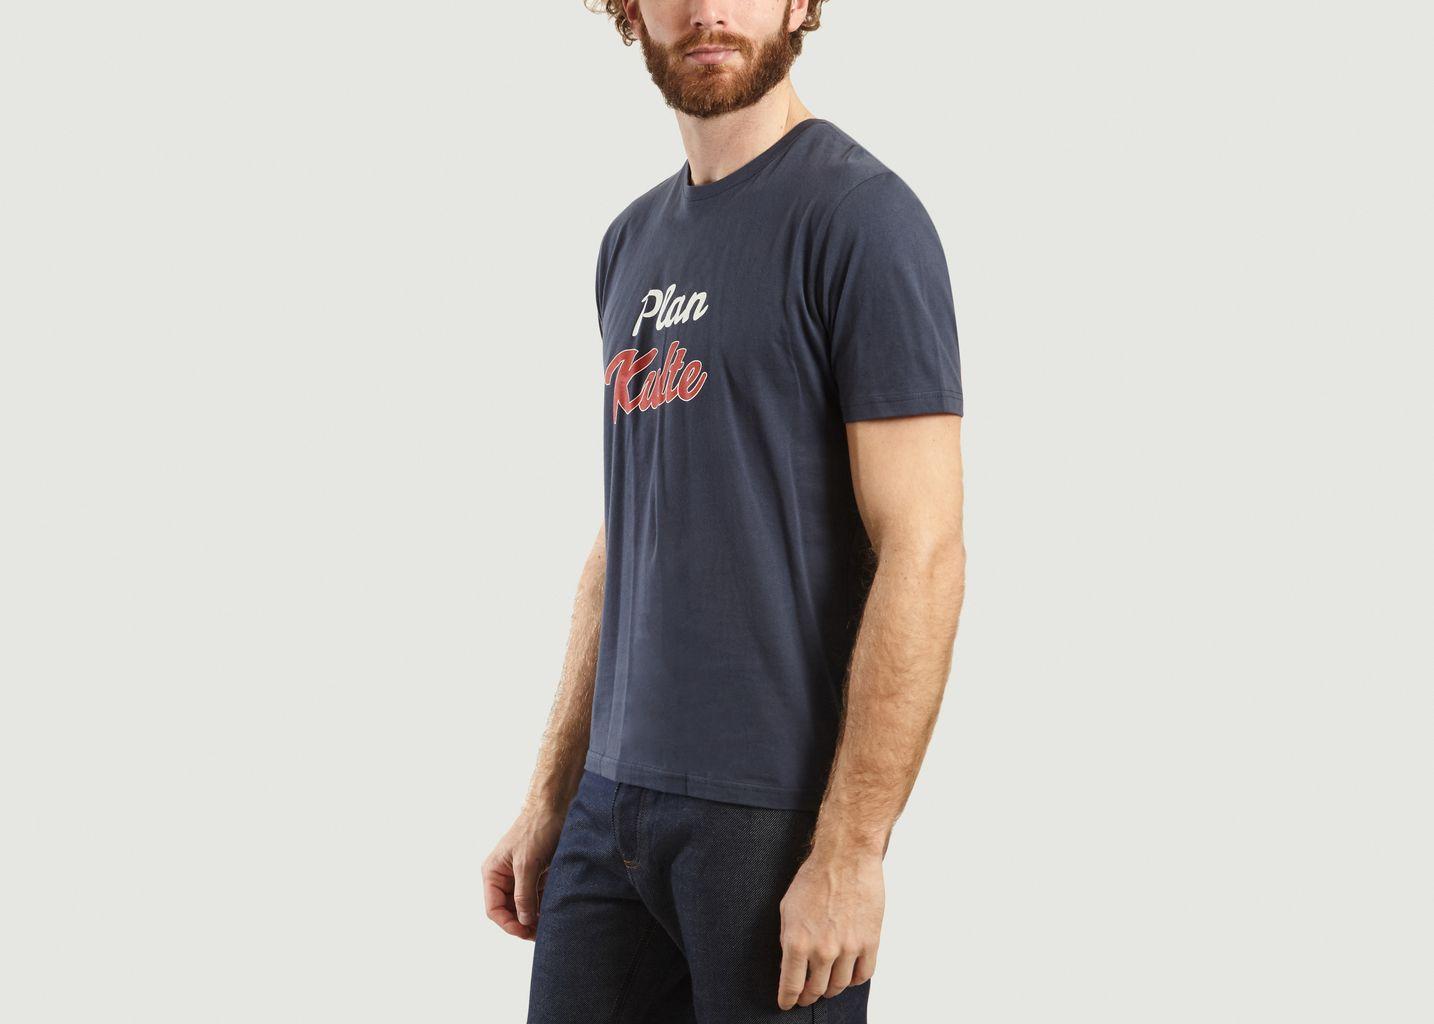 T-Shirt Plan Kulte - Kulte